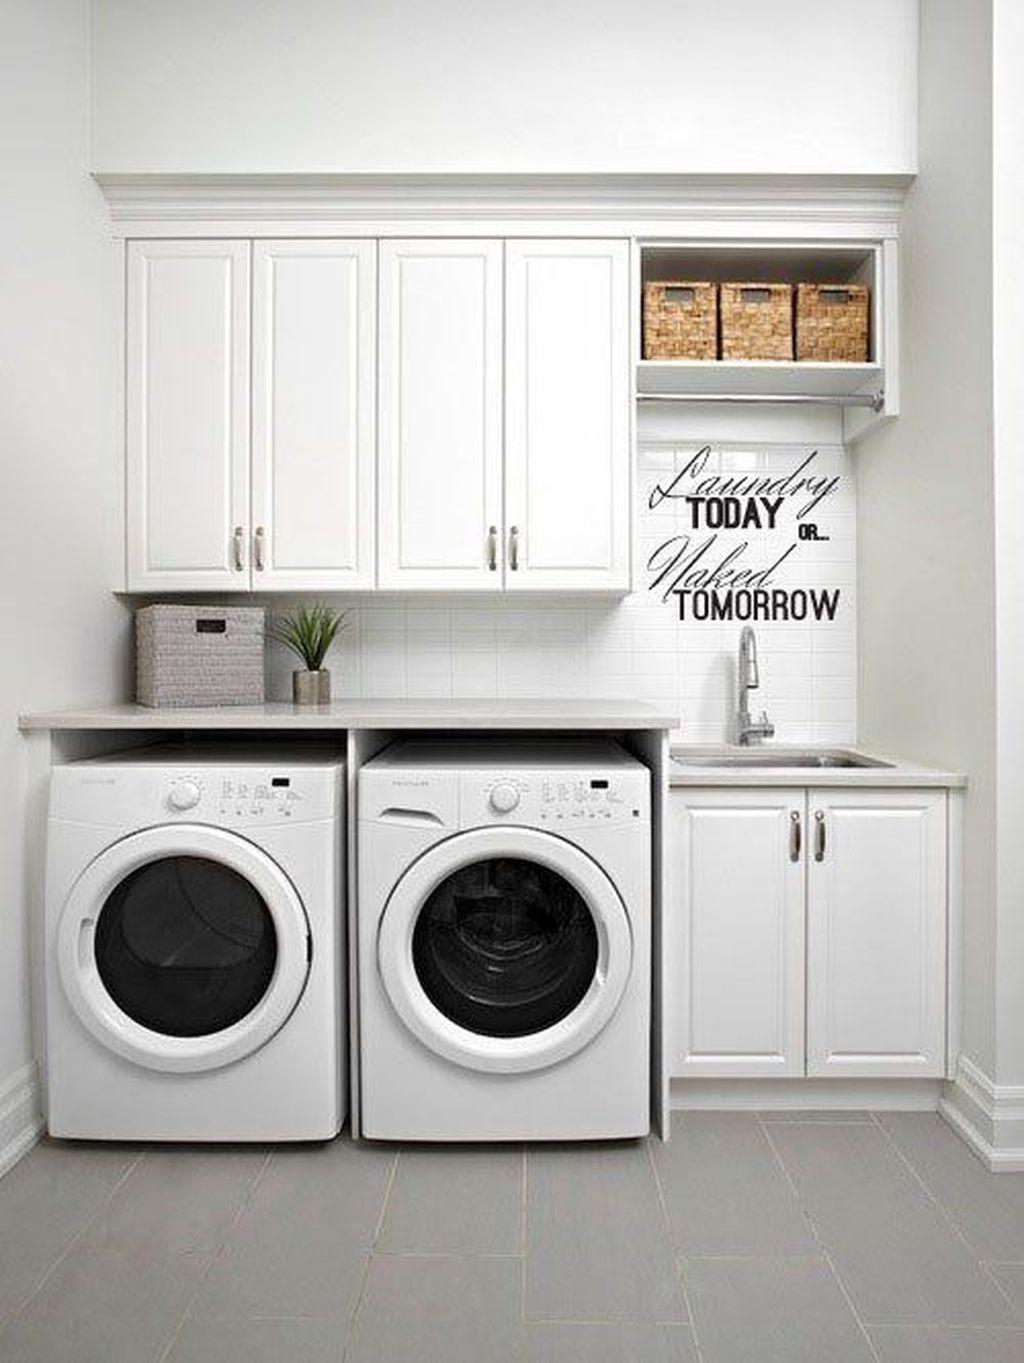 Amazing Laundry Room Tile Design42